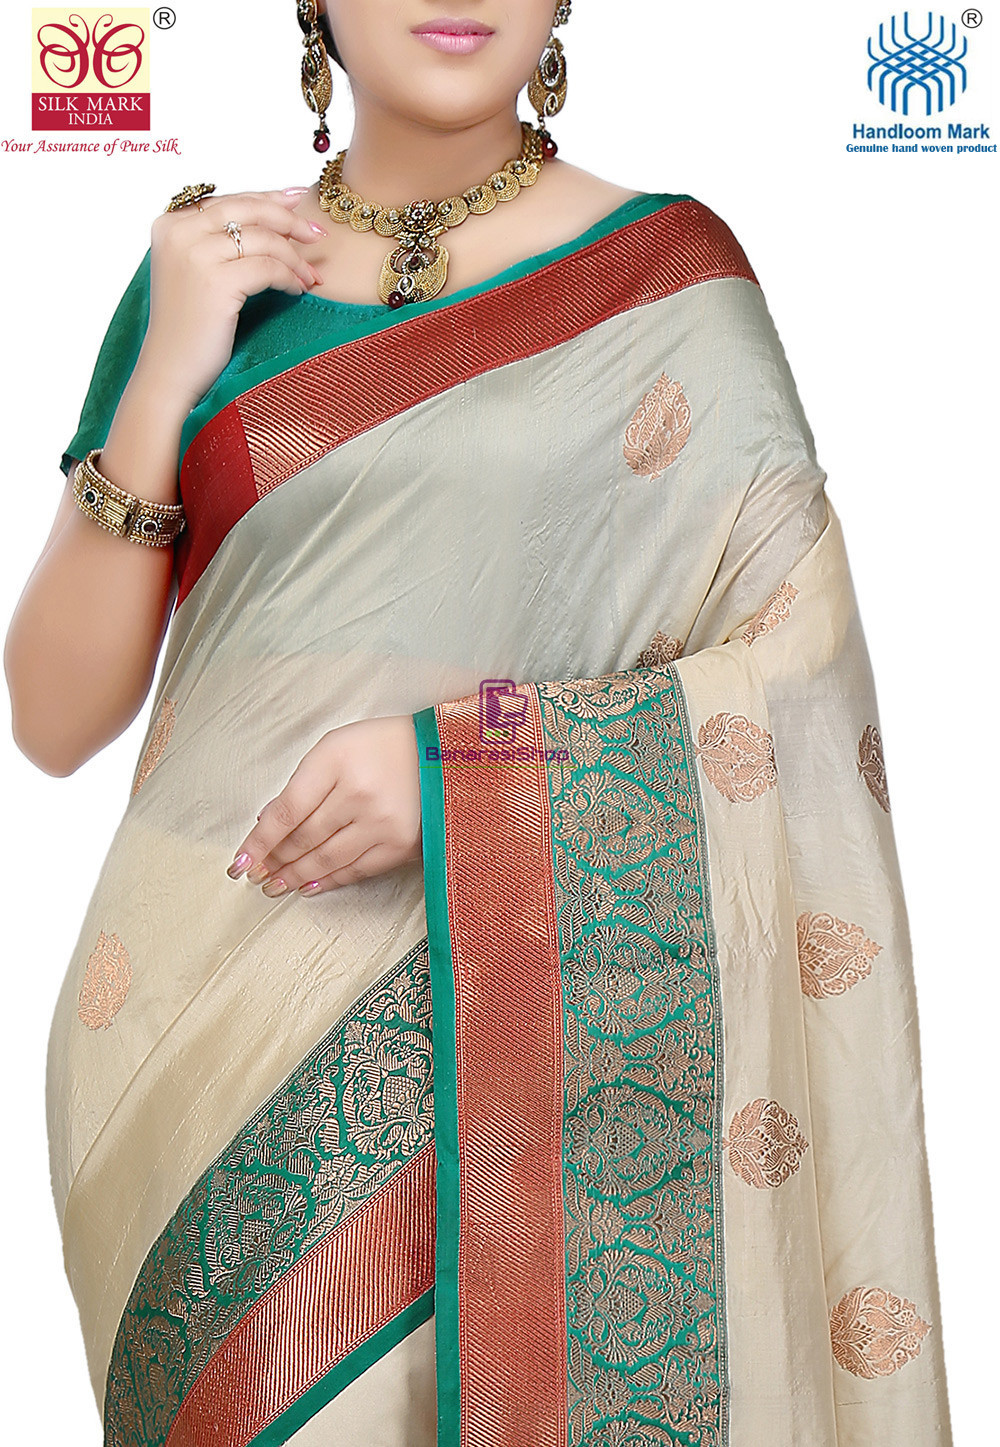 Banarasi Pure Katan Silk Handloom Saree in Light Beige 2